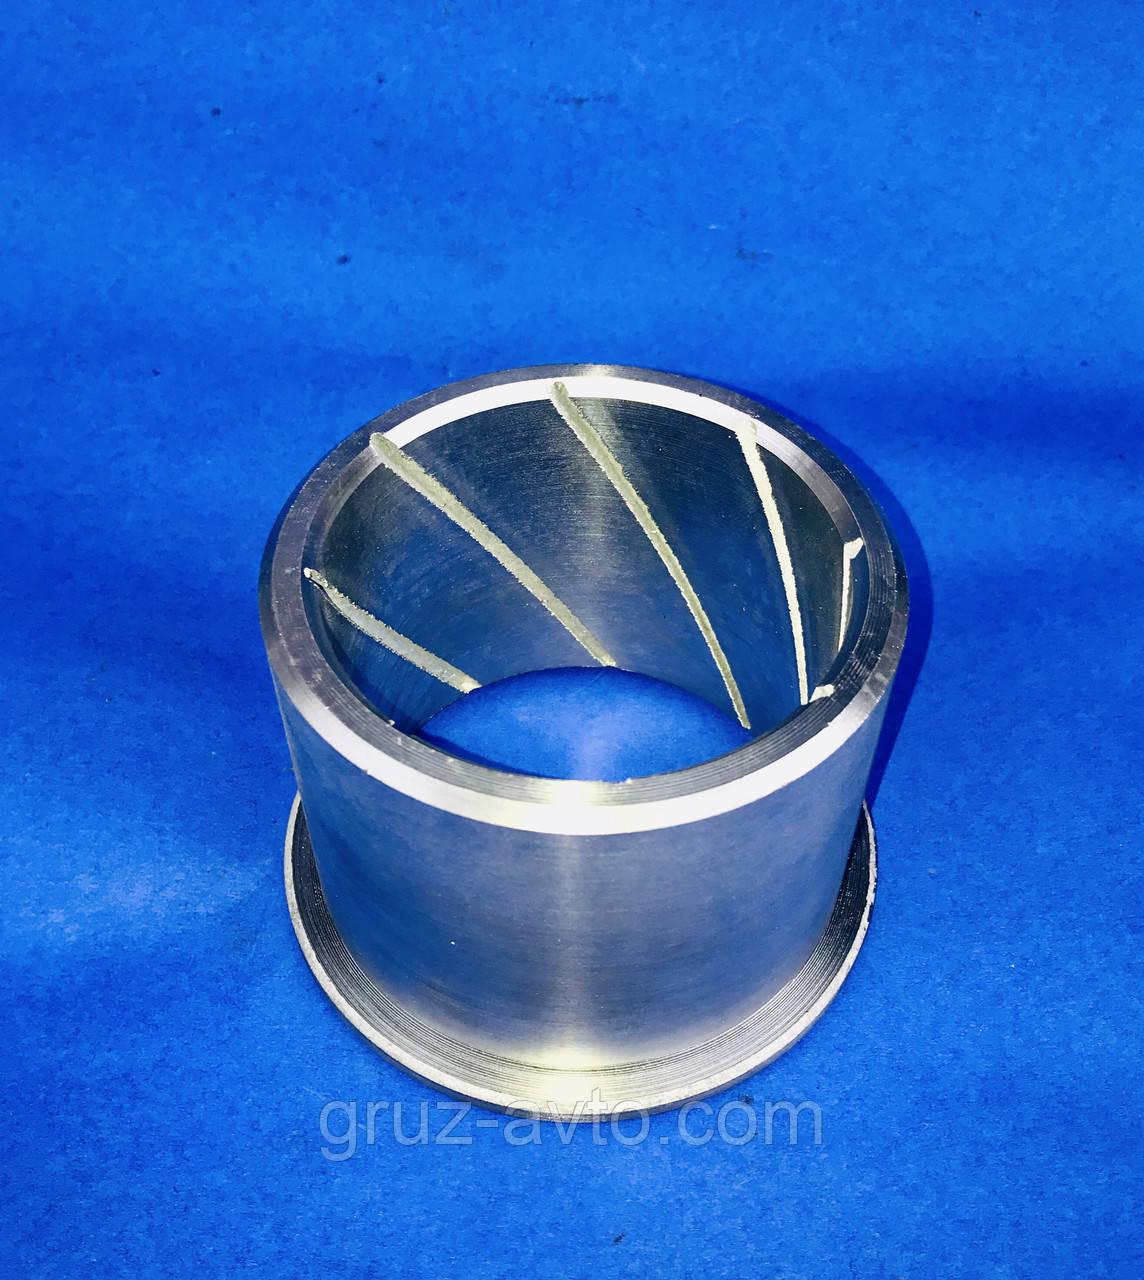 Втулка оси балансира Камаз цинк-алюминий-магний 102*86,5 / 5320-2918074-Р1